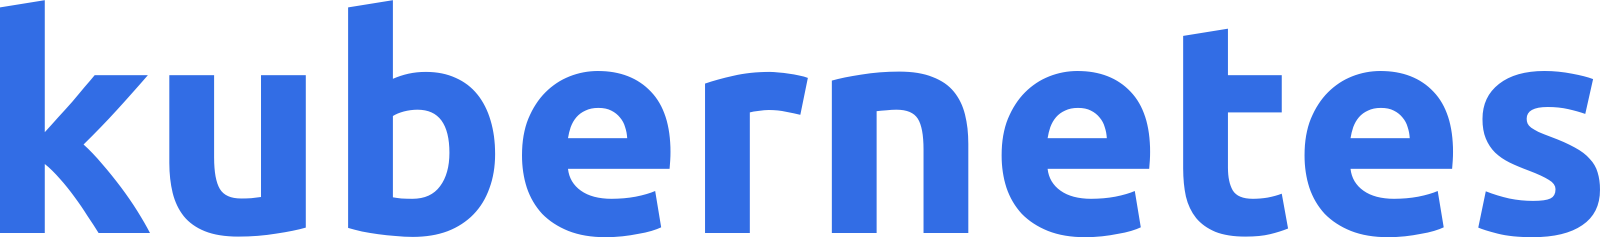 "<img src=""https://www.josedomingo.org/pledin/assets/wp-content/uploads/2018/05/name_blue.png"" alt="""" width=""1600"" height=""237"" class=""aligncenter size-full wp-image-1988"" />"